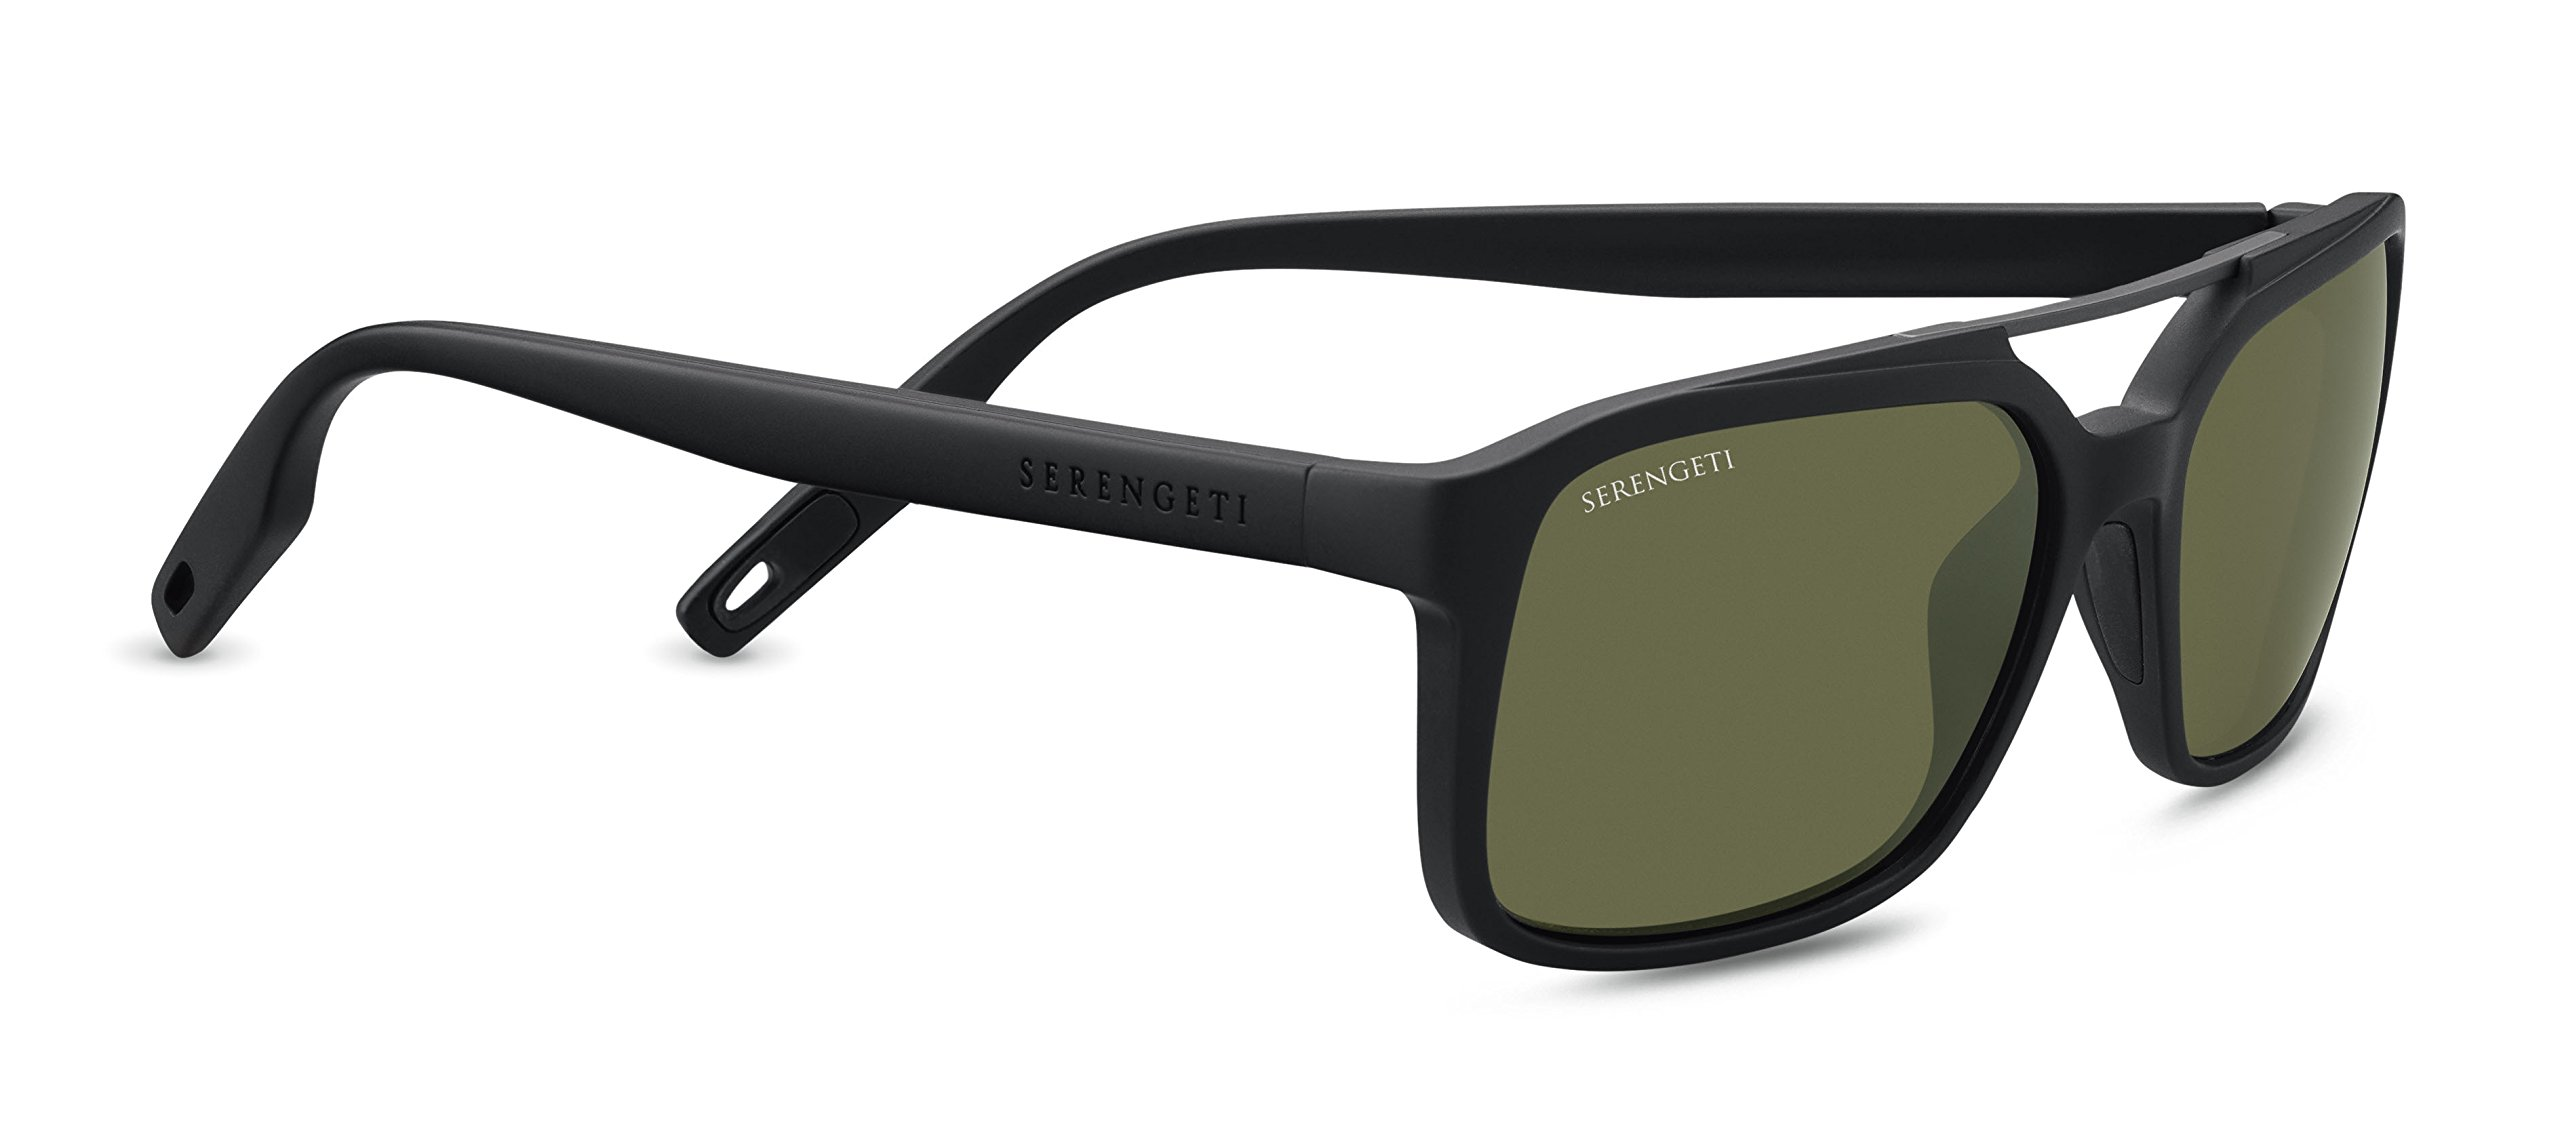 Serengeti Renzo Sunglasses Satin Black/Satin Dark Gunmetal, Green